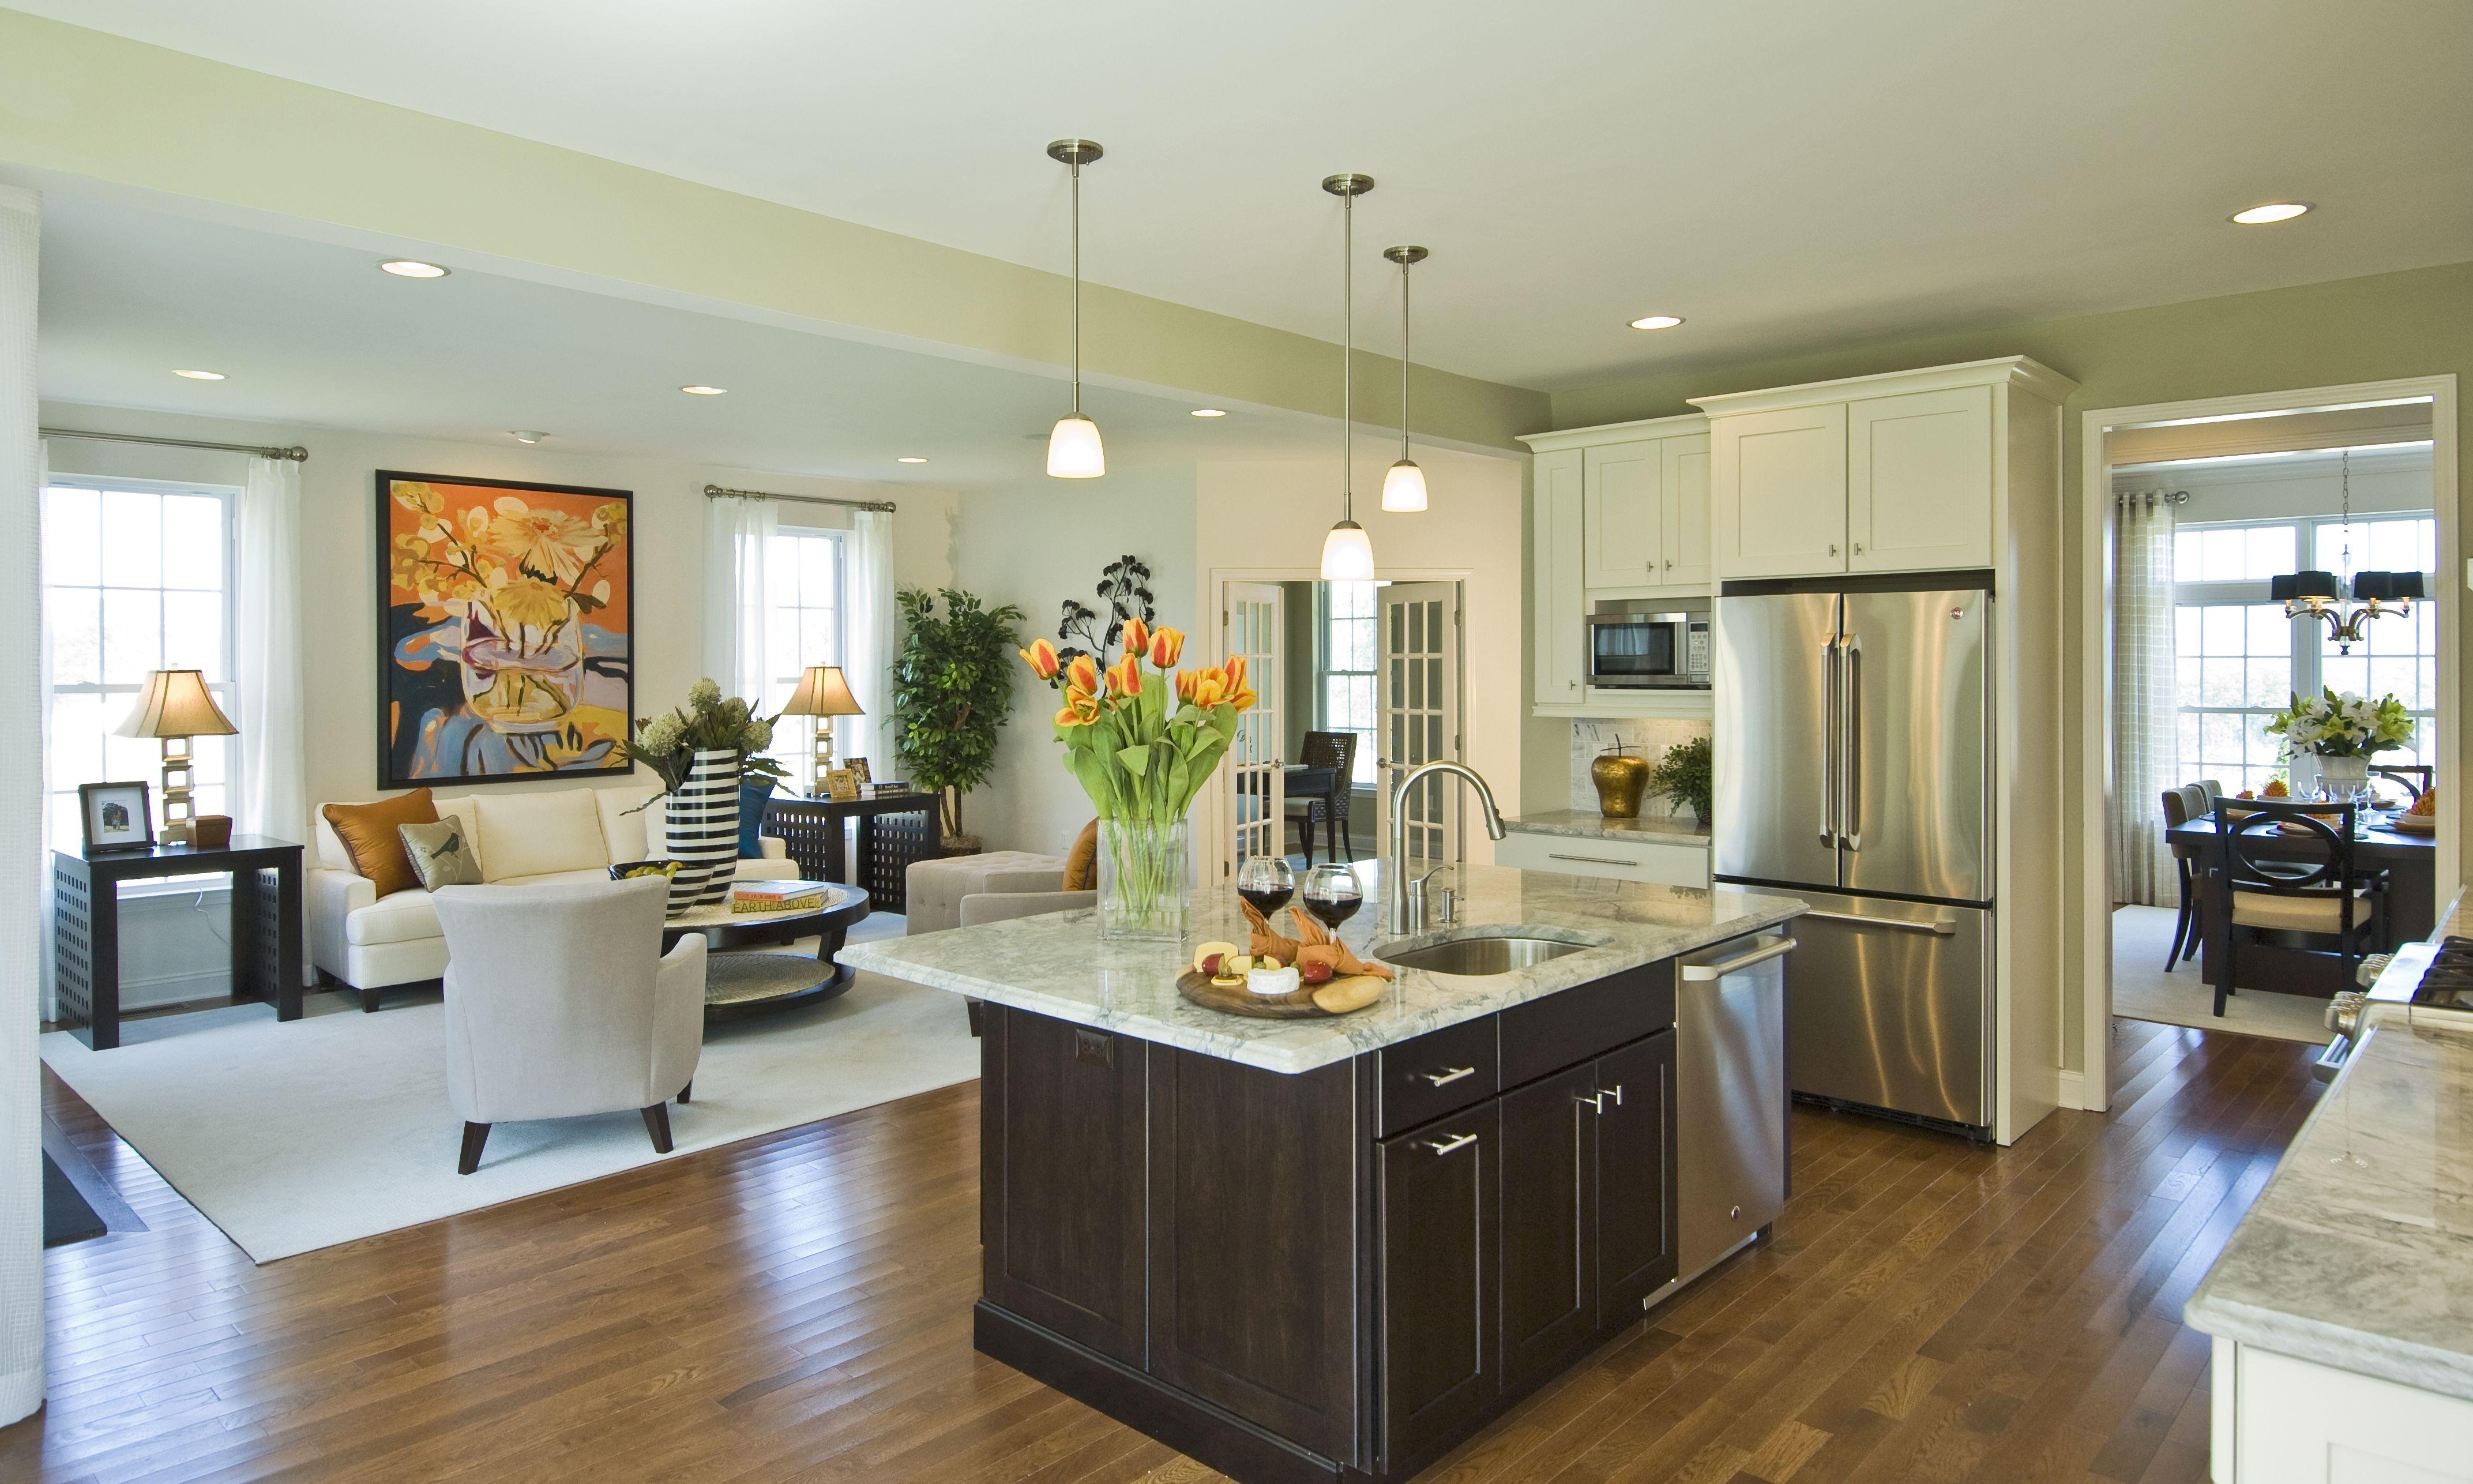 Fondos de pantalla : habitación, casa, cocina, diseño de interiores ...